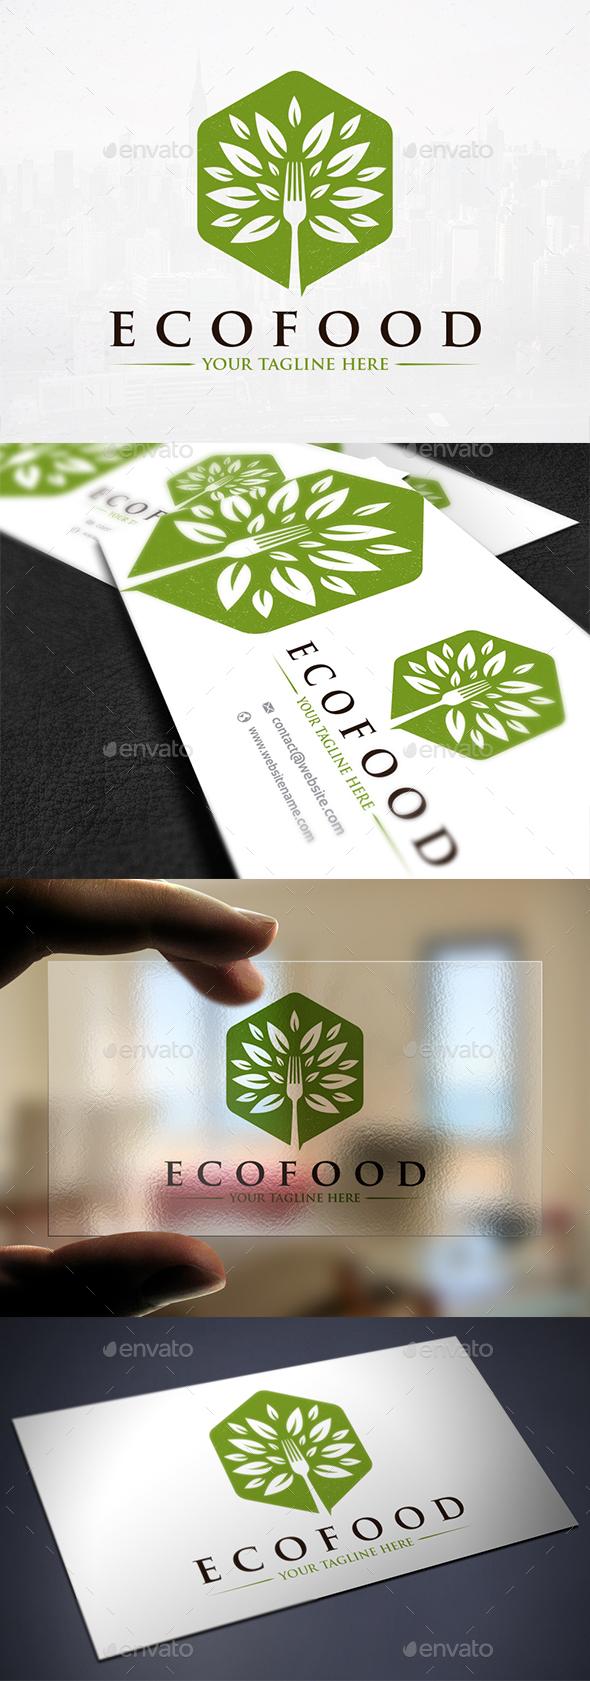 Green Fork Tree Logo - Nature Logo Templates